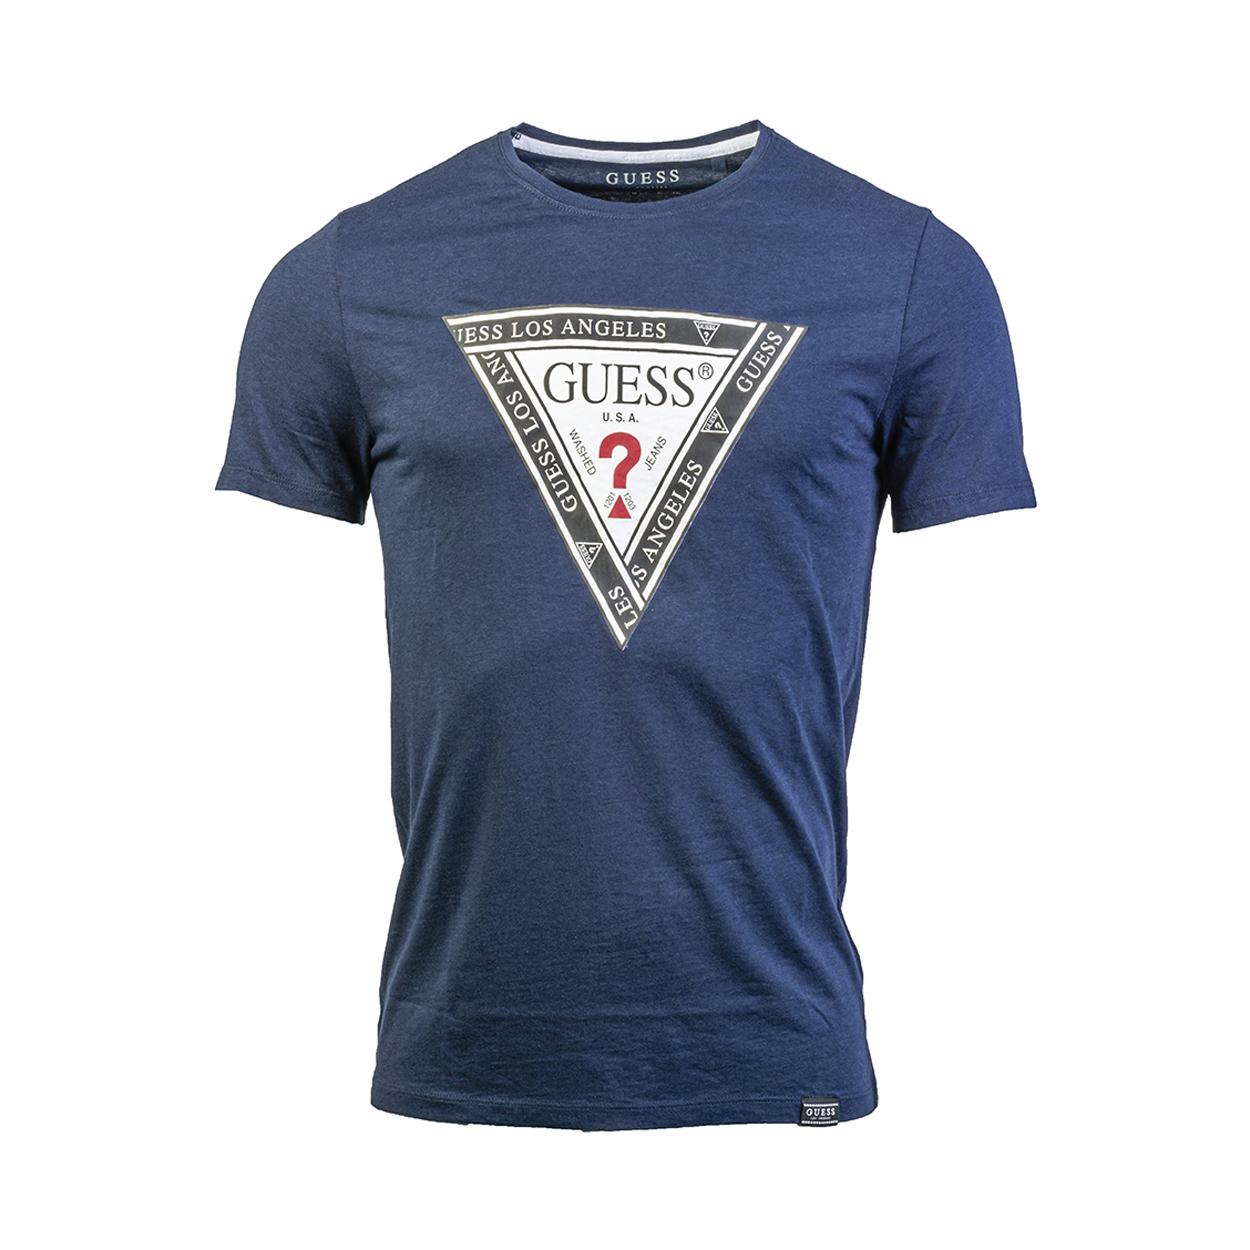 Tee-shirt col rond guess wrapped en coton et modal bleu marine floqué